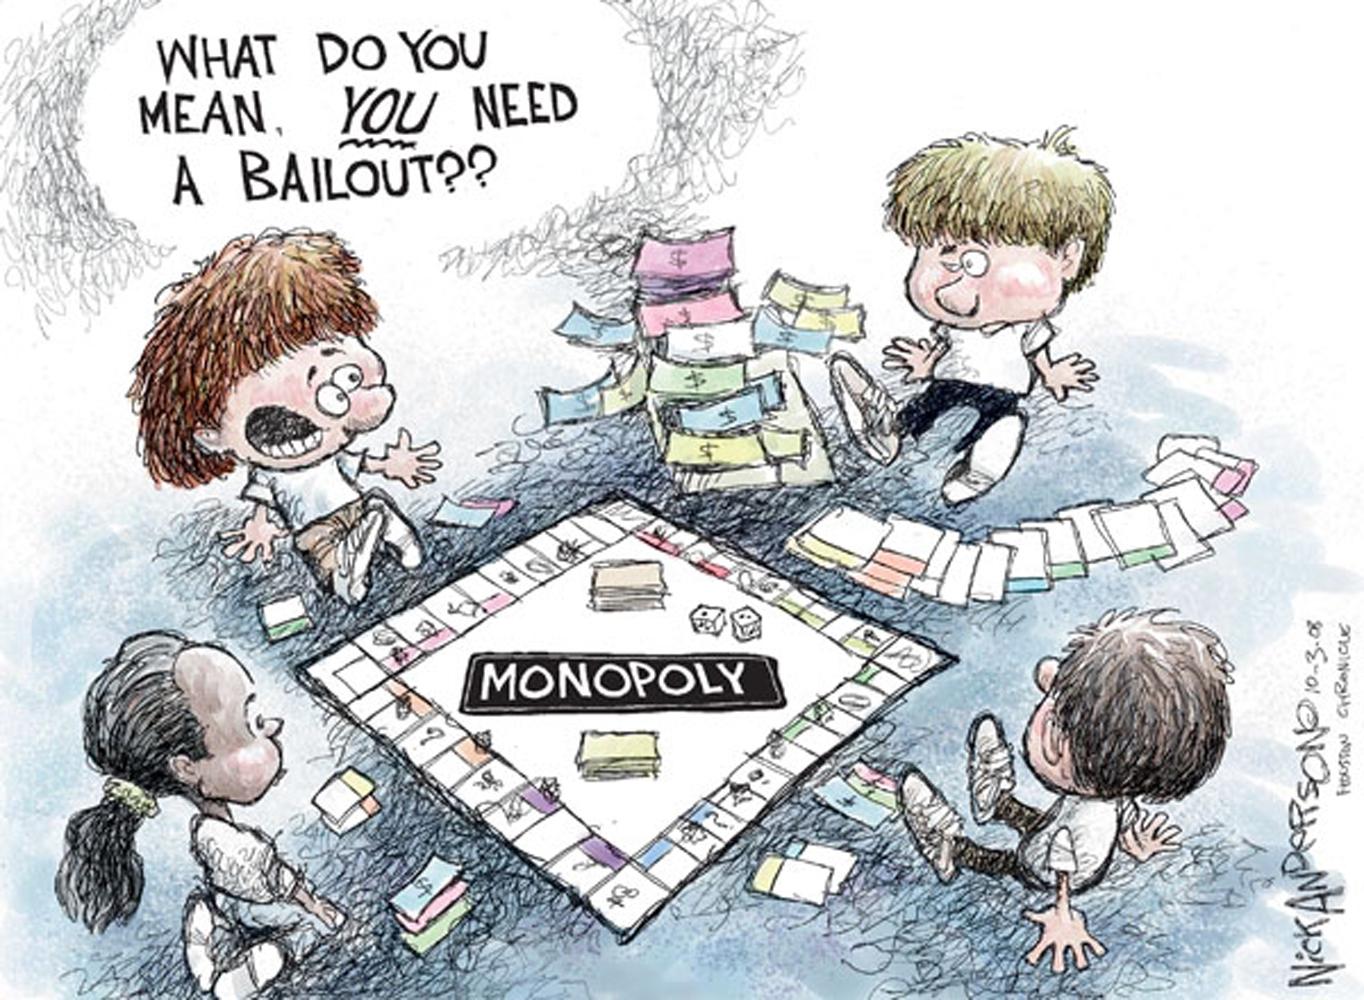 Standard oil monopoly